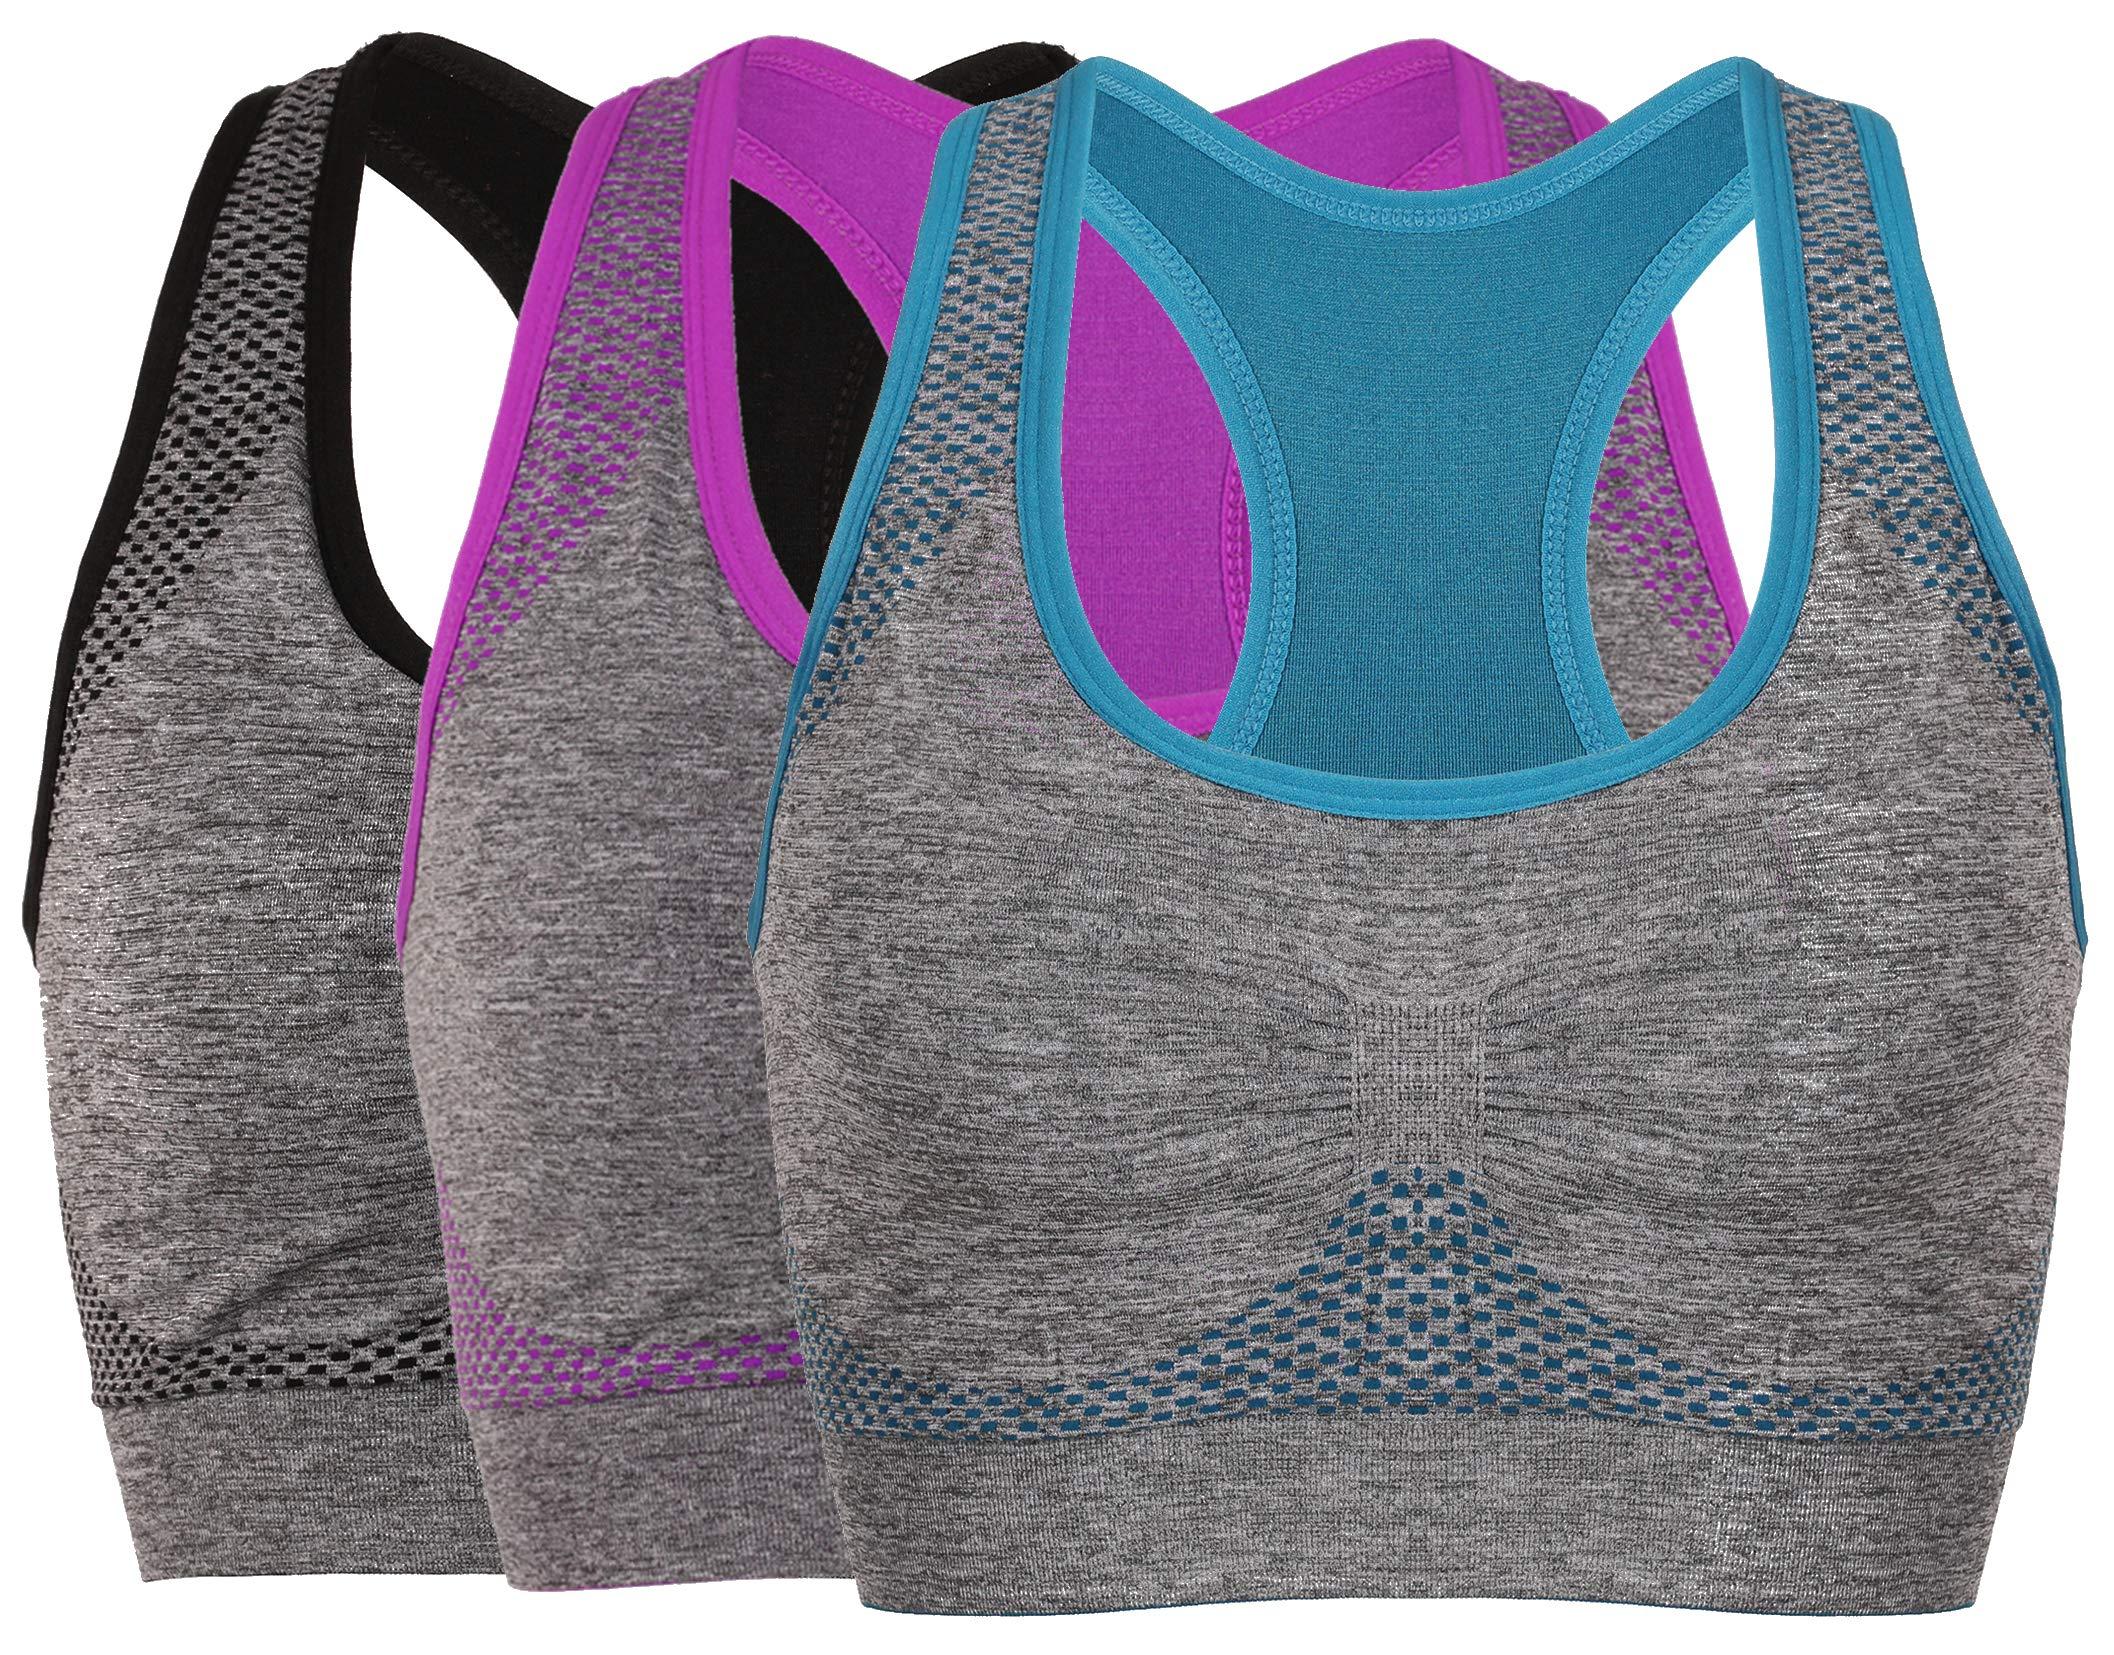 Vermilion Bird Women's Seamless Sports Bra High Impact Pocket Yoga Bras (30A 30B 30C 30D 32A 32B 32C, 3 Pack:Blue Grey Purple)